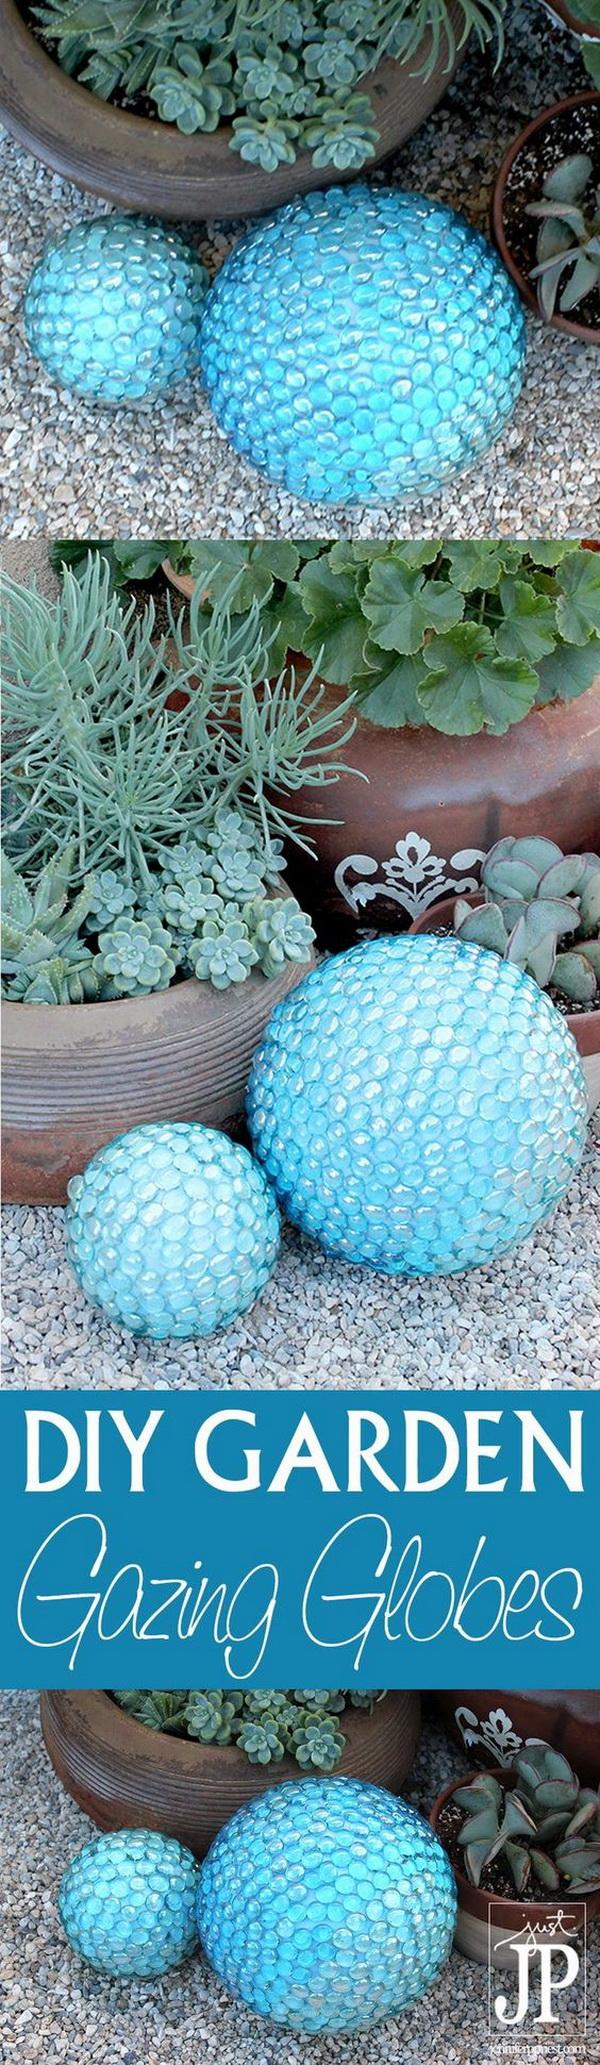 DIY Faux Gazing Ball For The Garden.